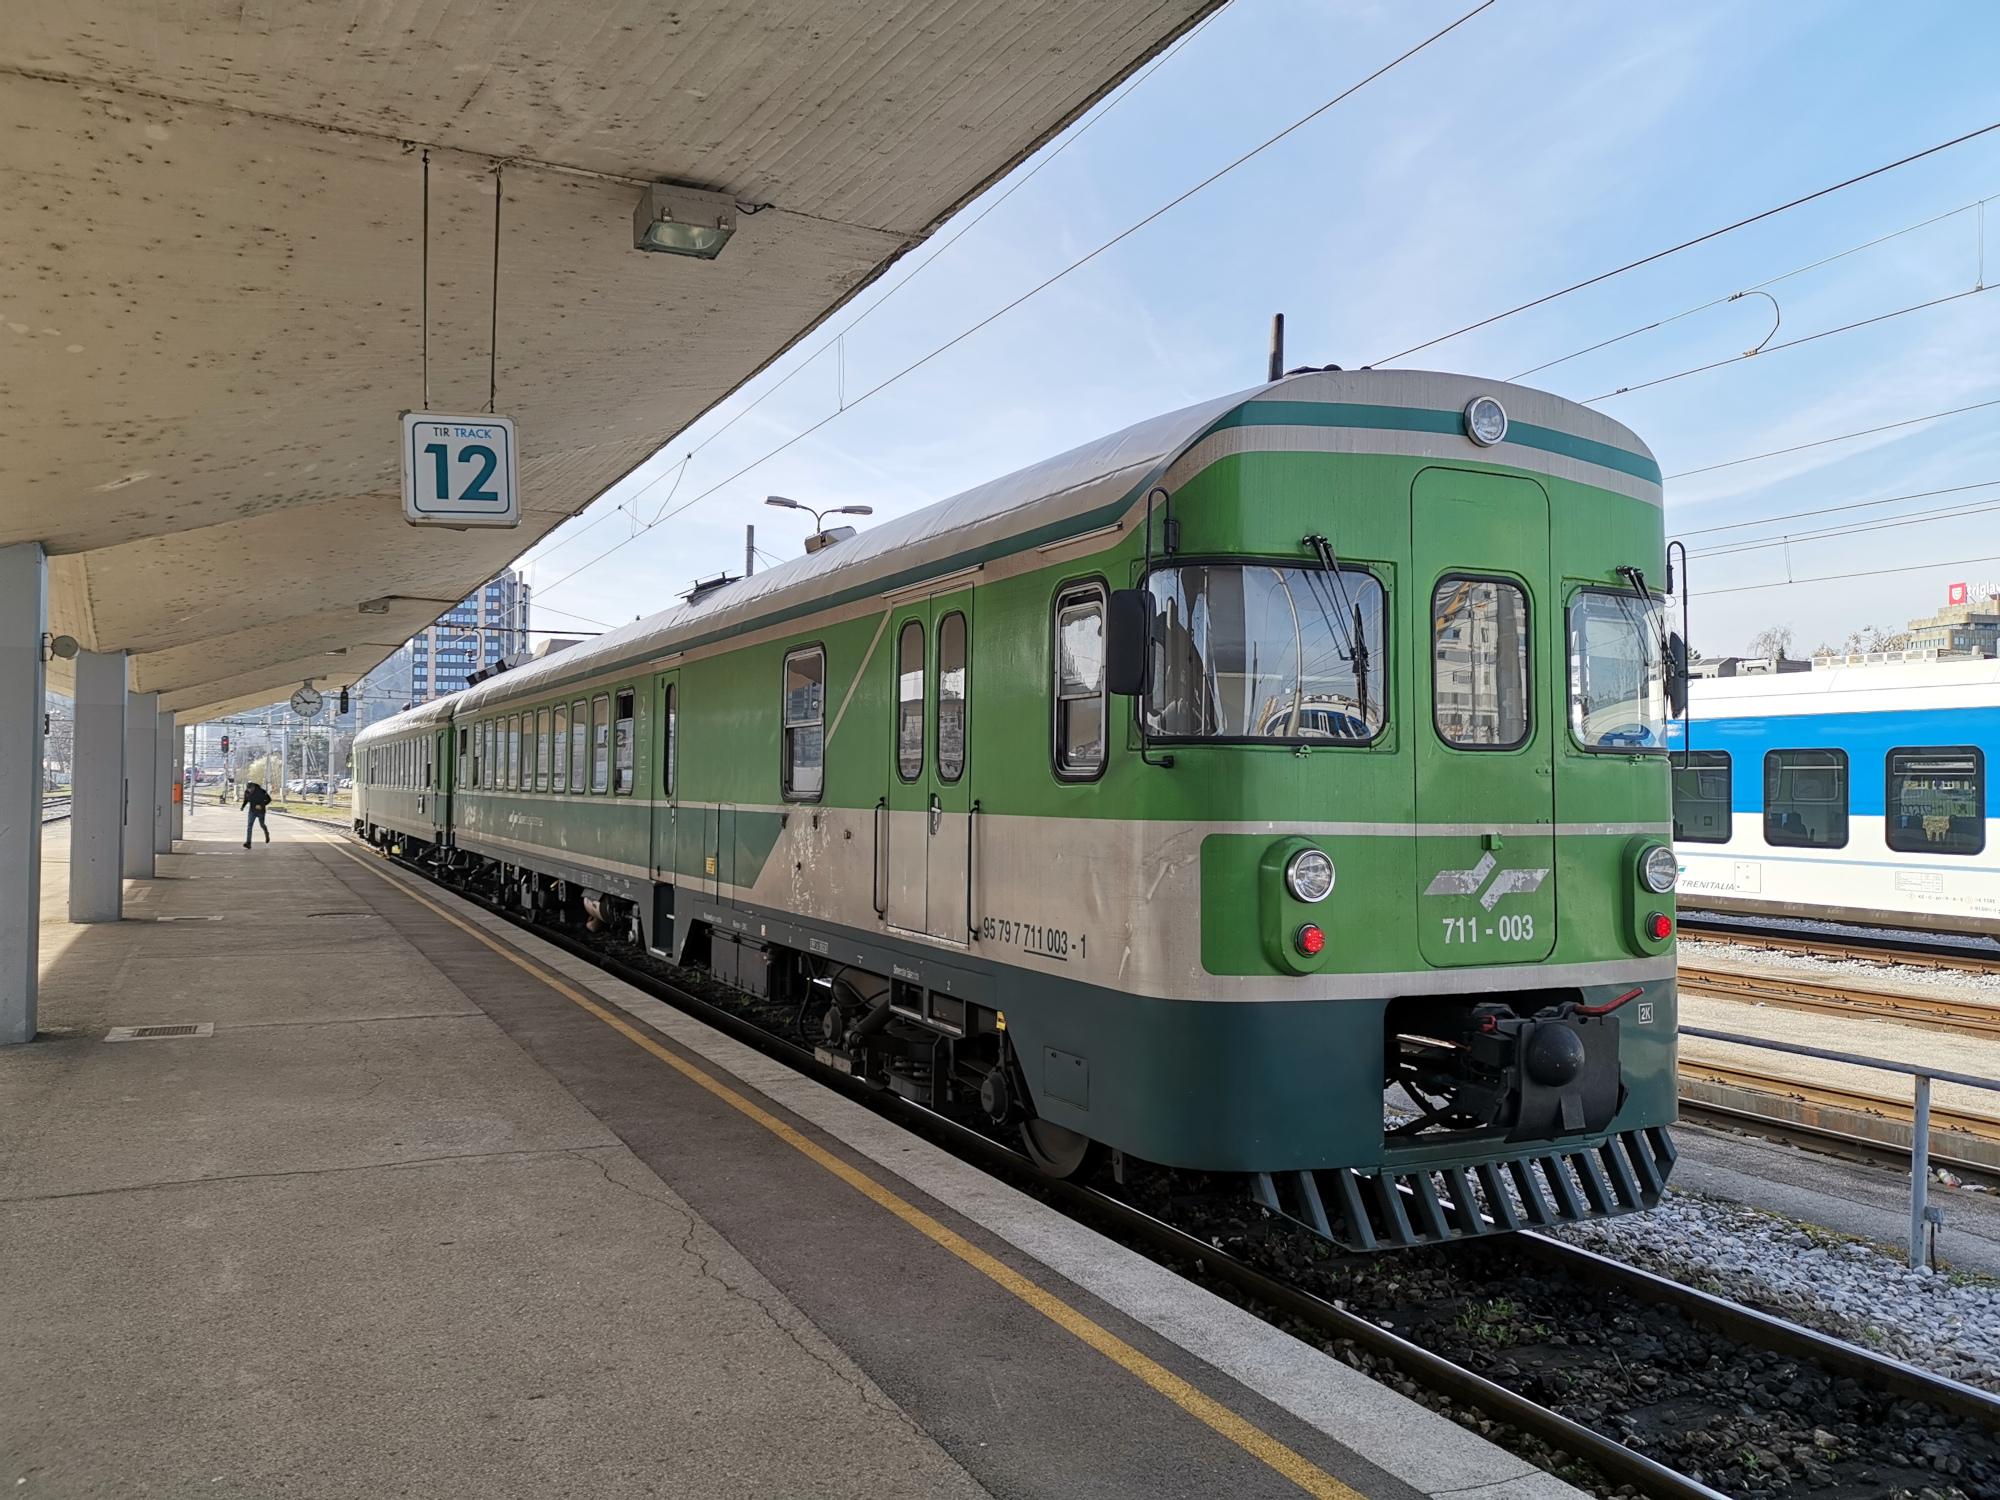 slovenske-zeleznice-vlak-mercedes-711